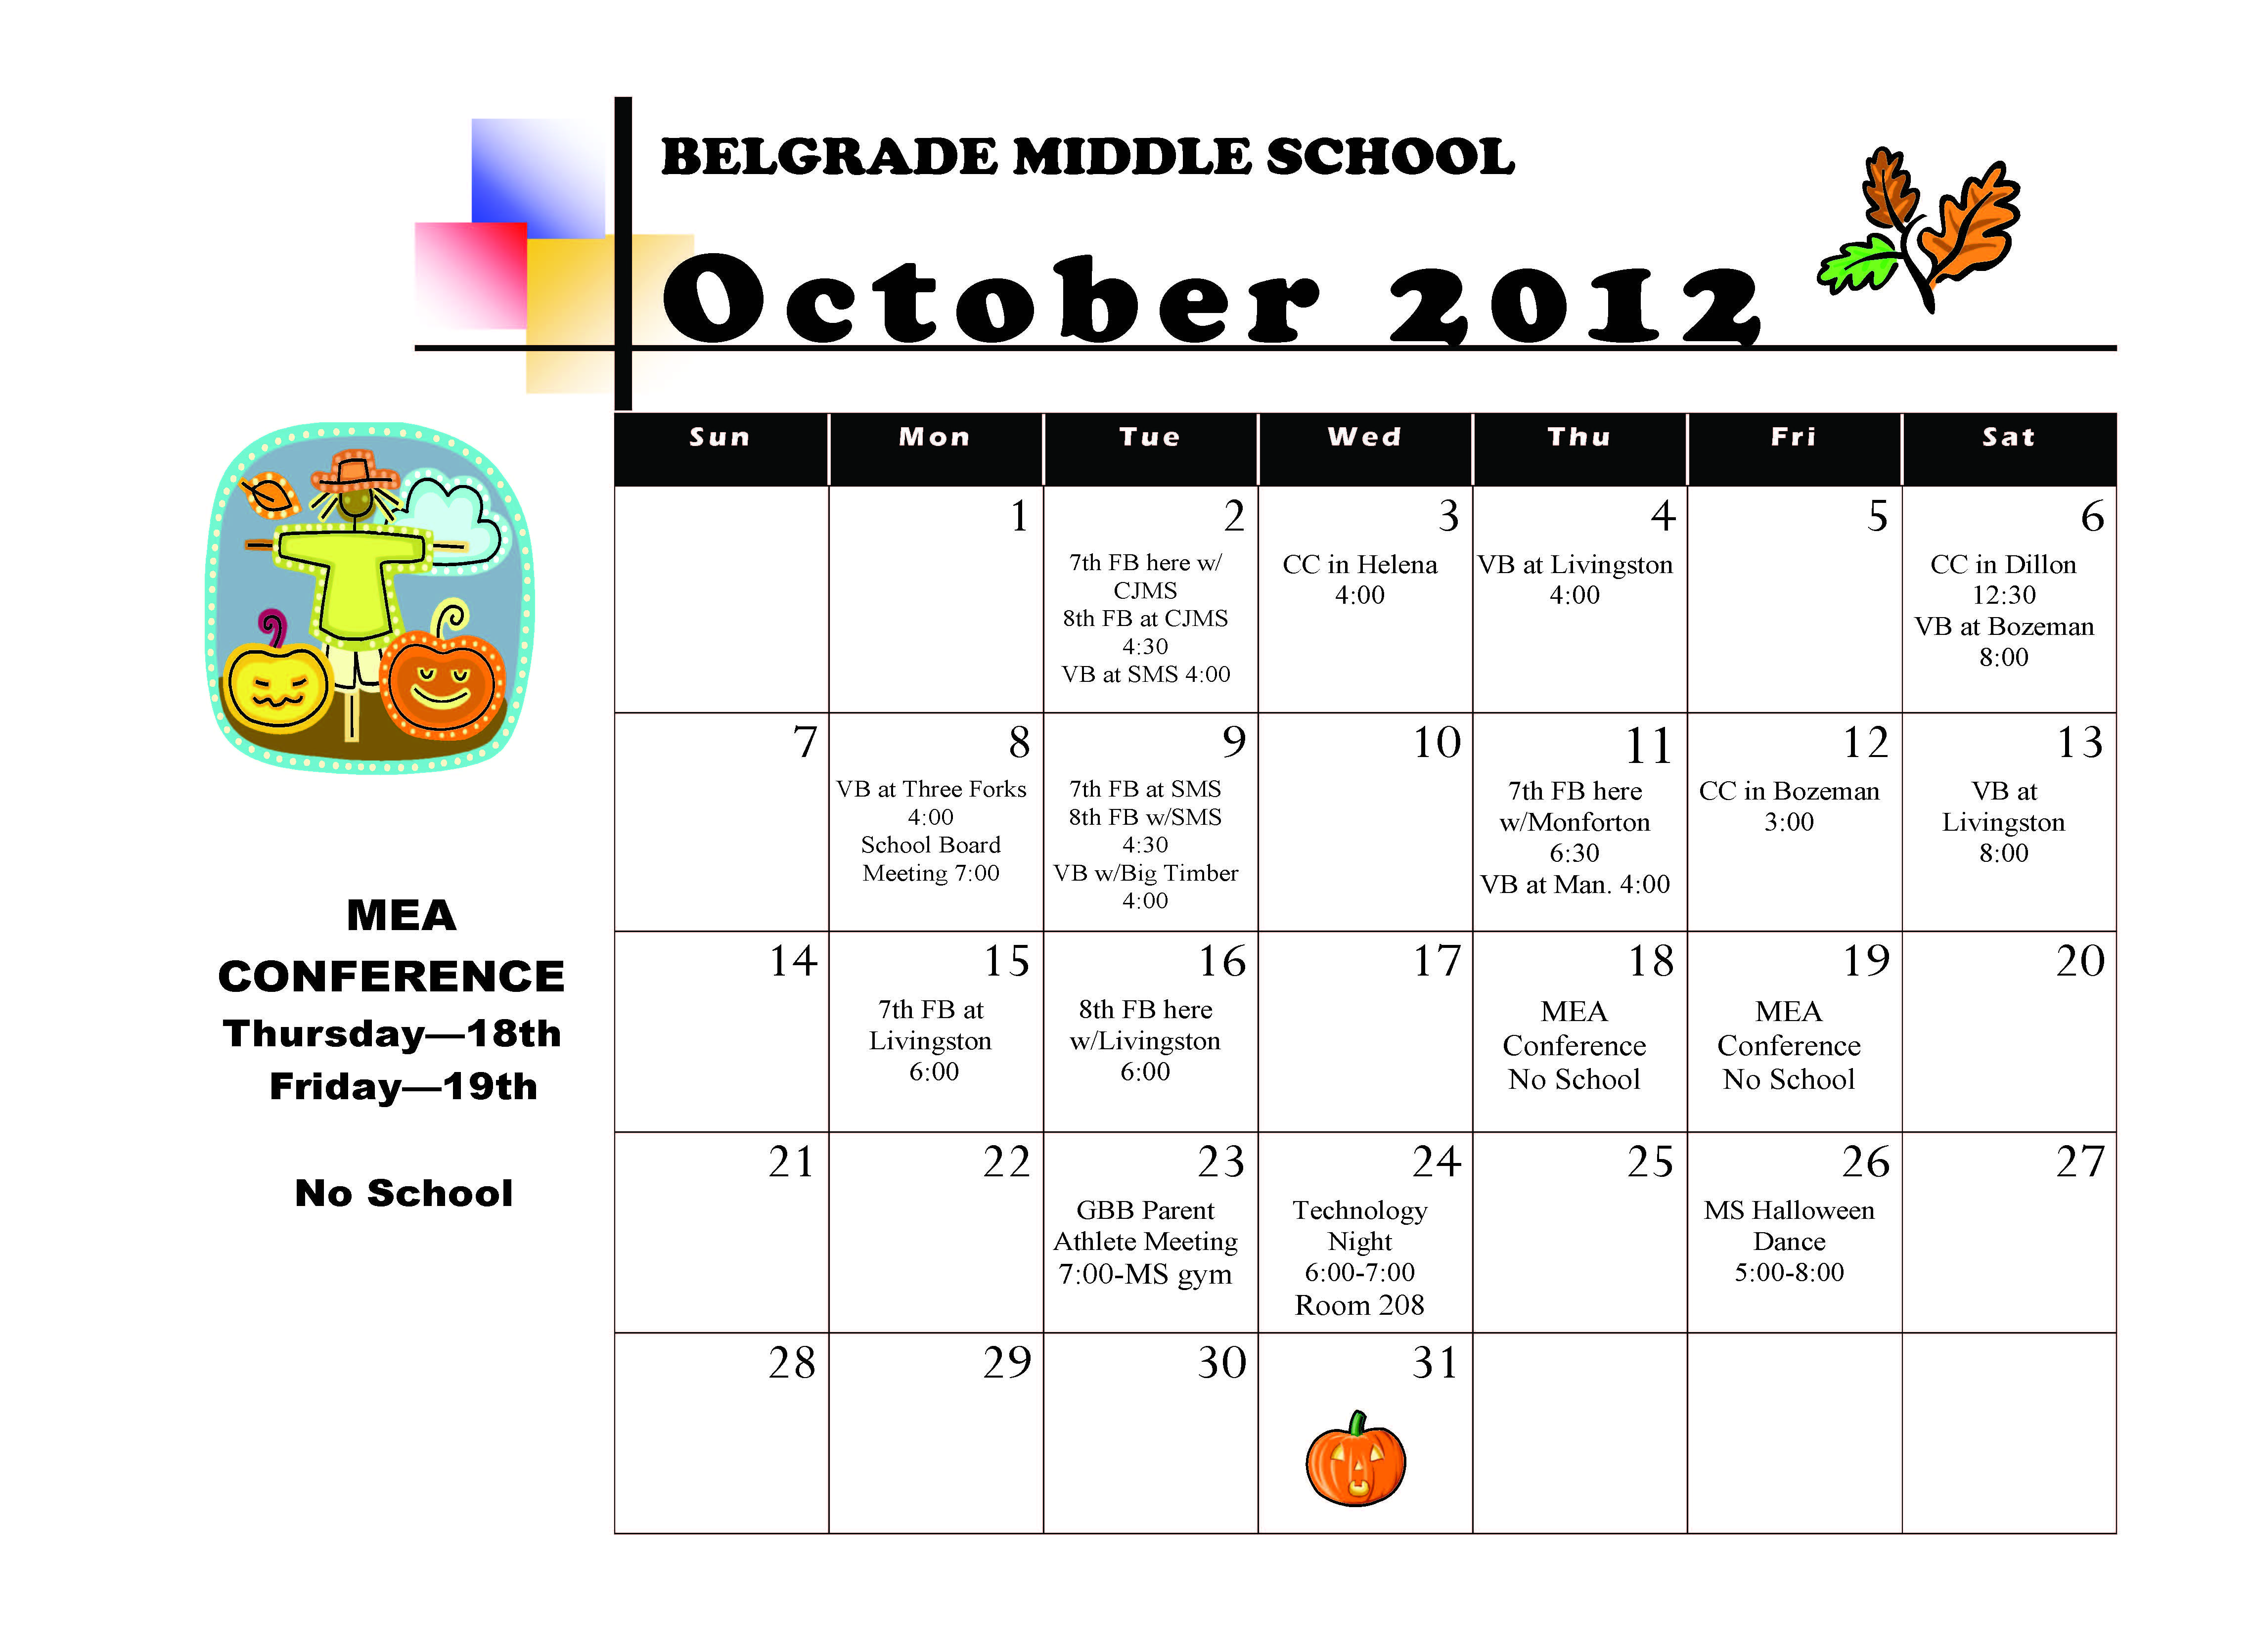 Middle School October Activity Calendar